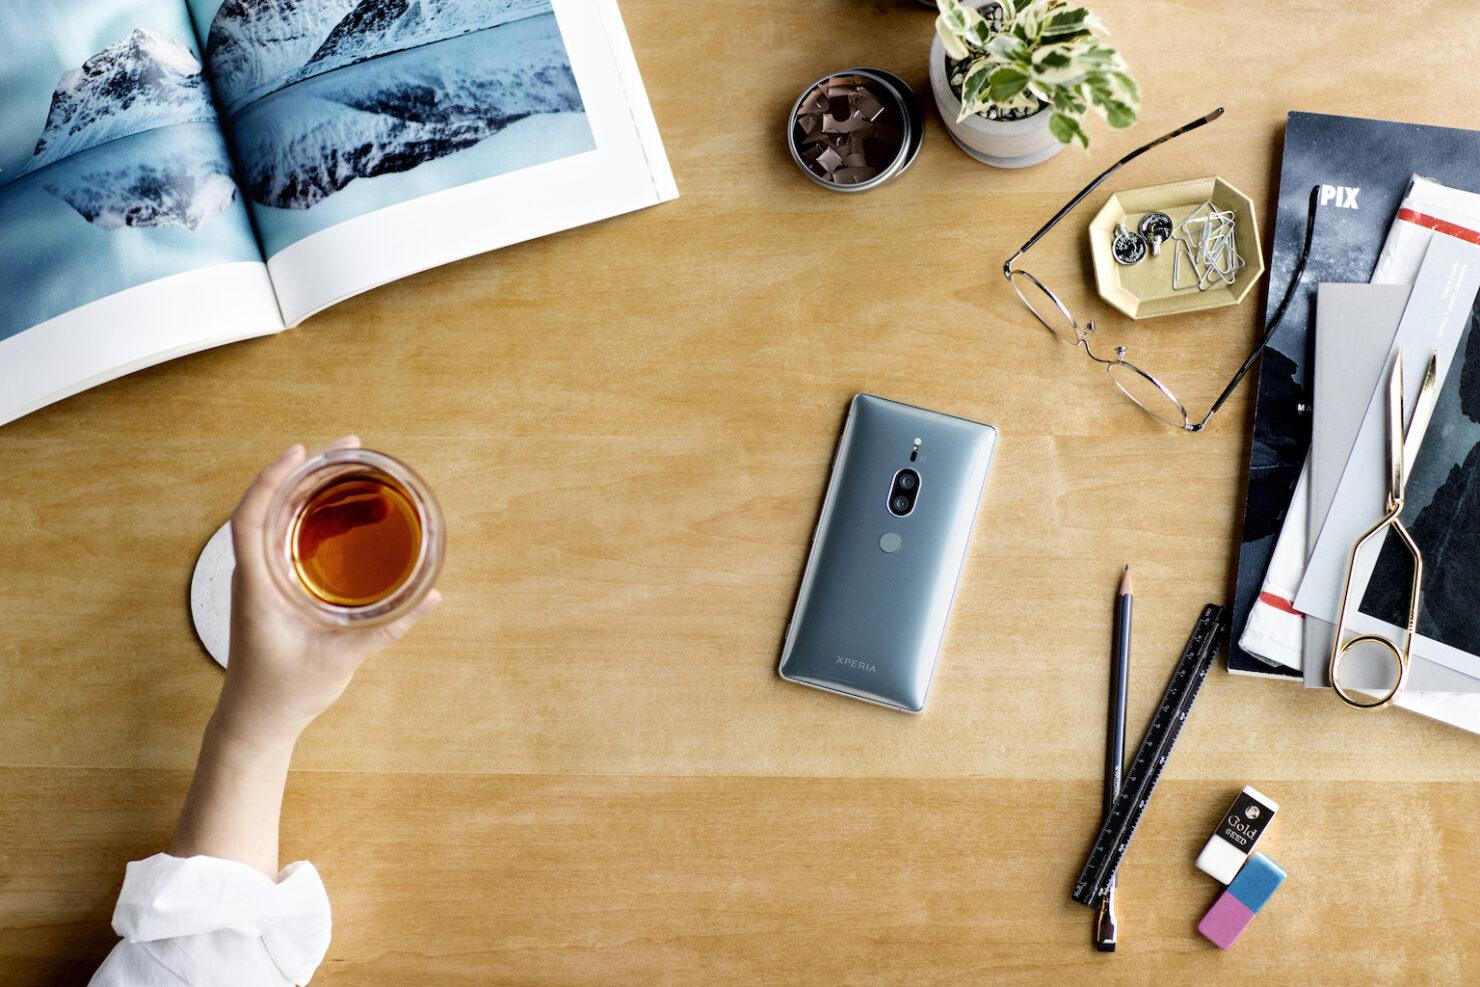 Sony Xperia XZ2 Premium Will Go on Sale on July 30